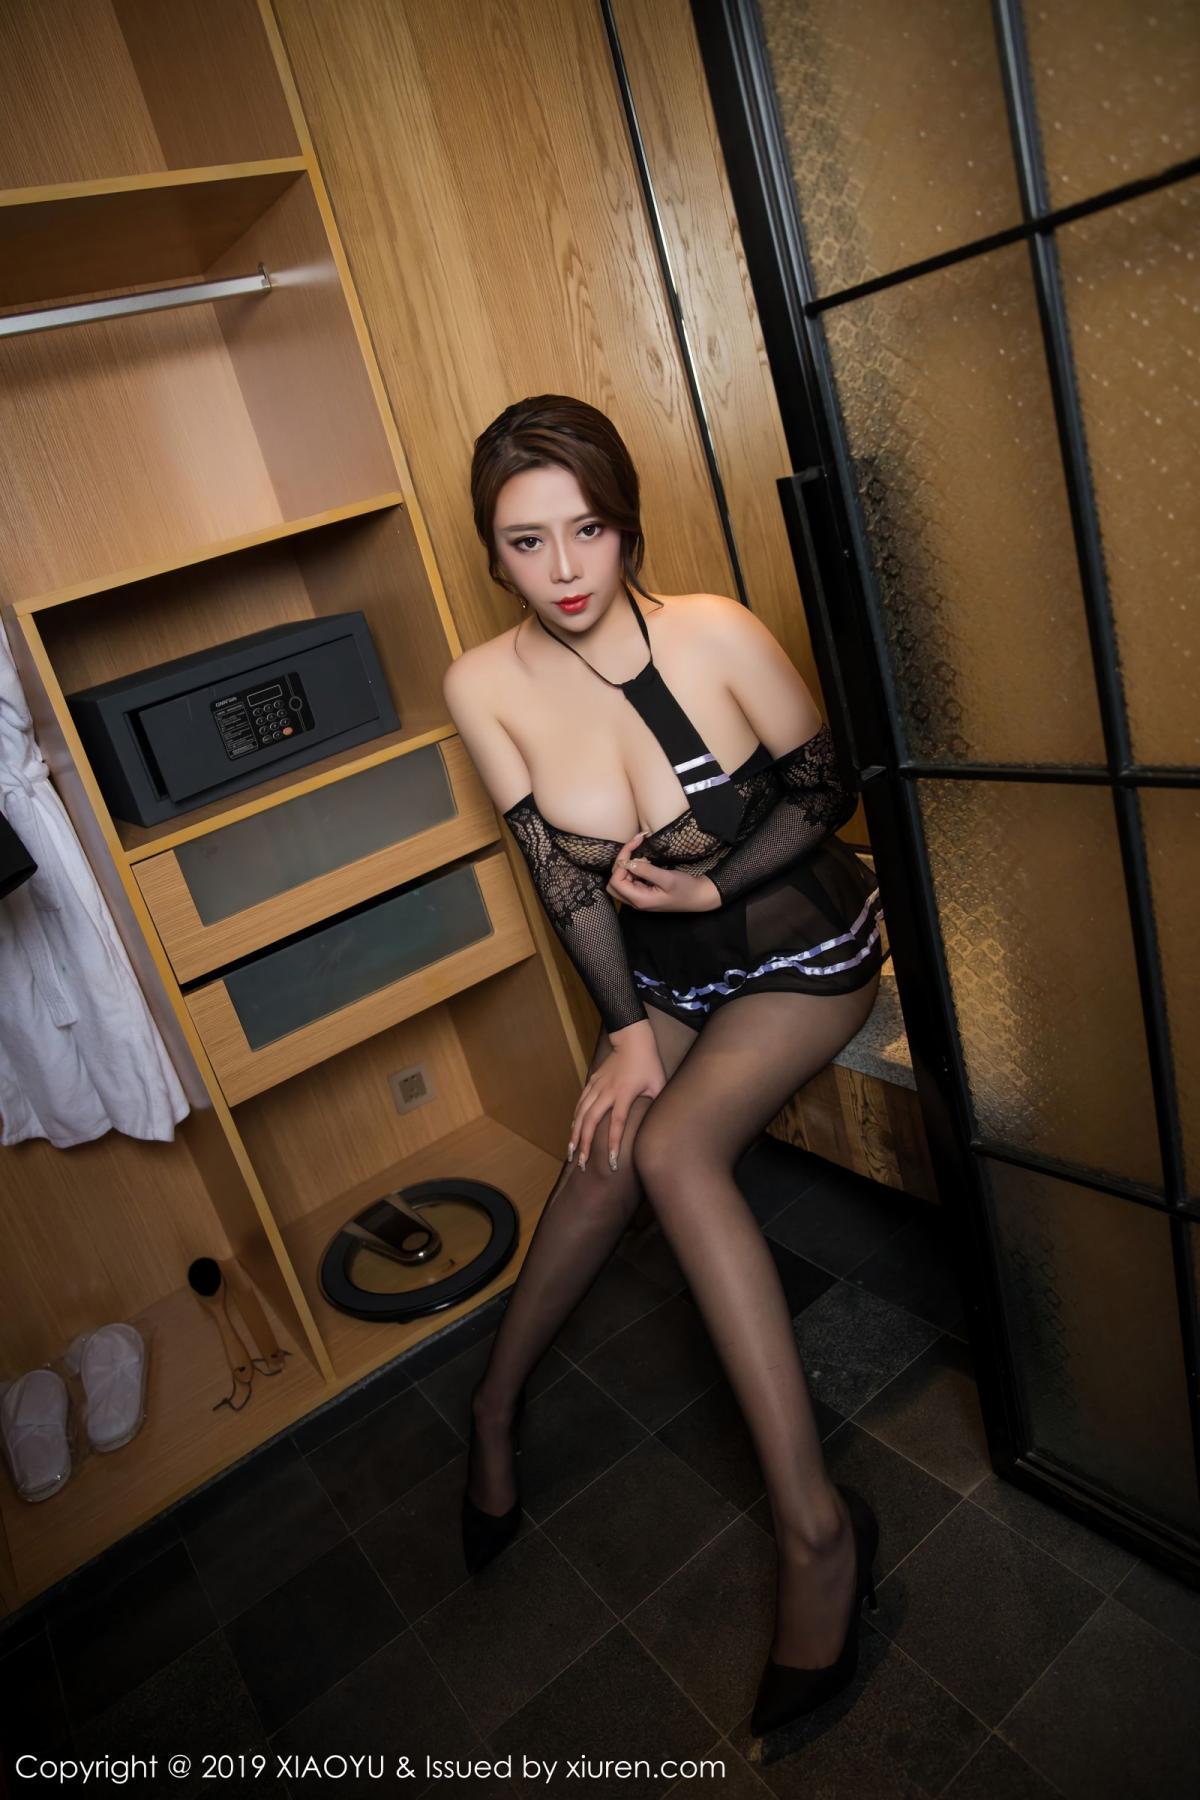 [XiaoYu] Vol.016 Miki Tu 20P, Miki Tu, Tall, XiaoYu